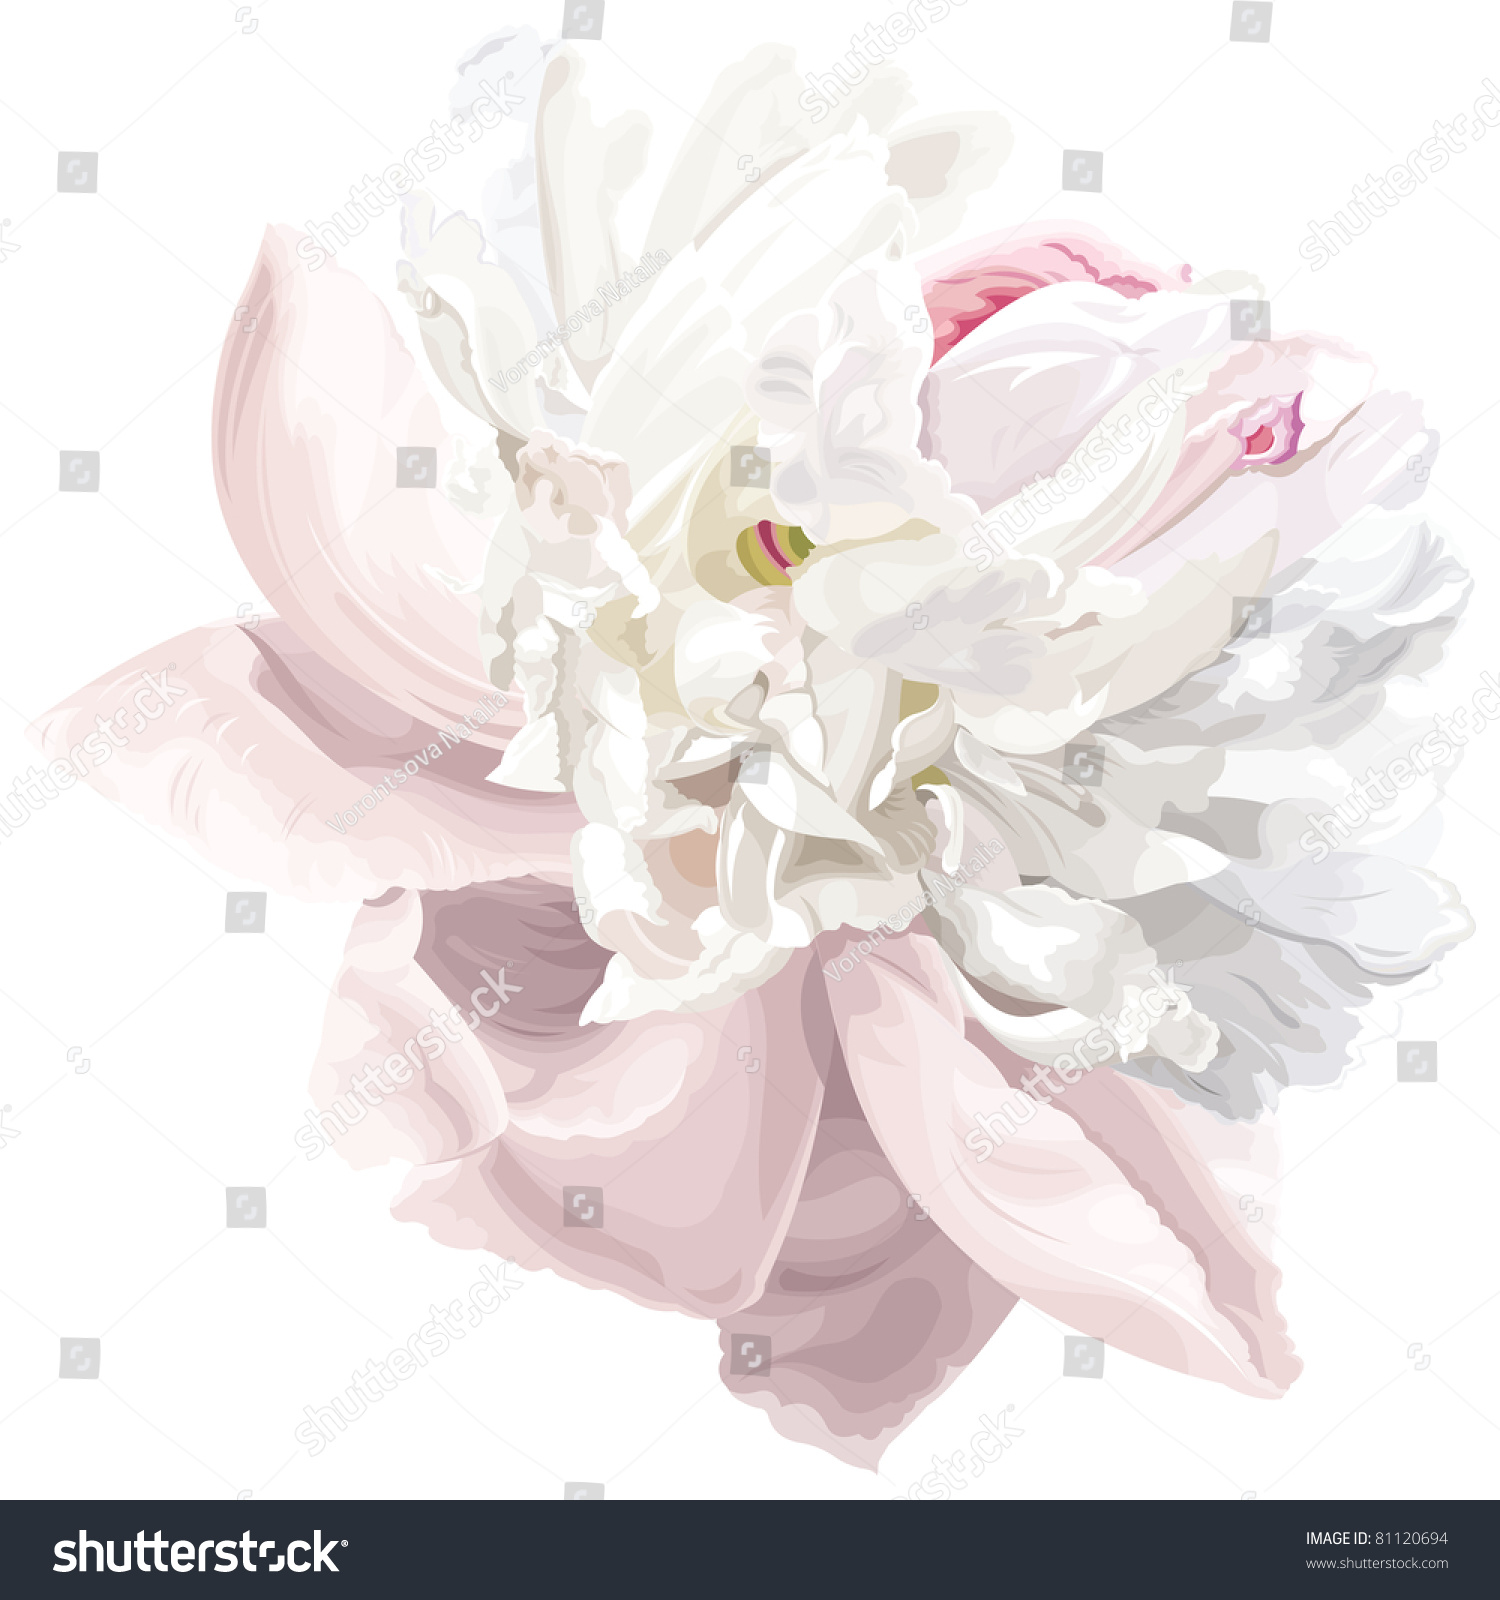 Royalty free luxurious white peony flower painted in 81120694 luxurious white peony flower painted in pastel colors 81120694 mightylinksfo